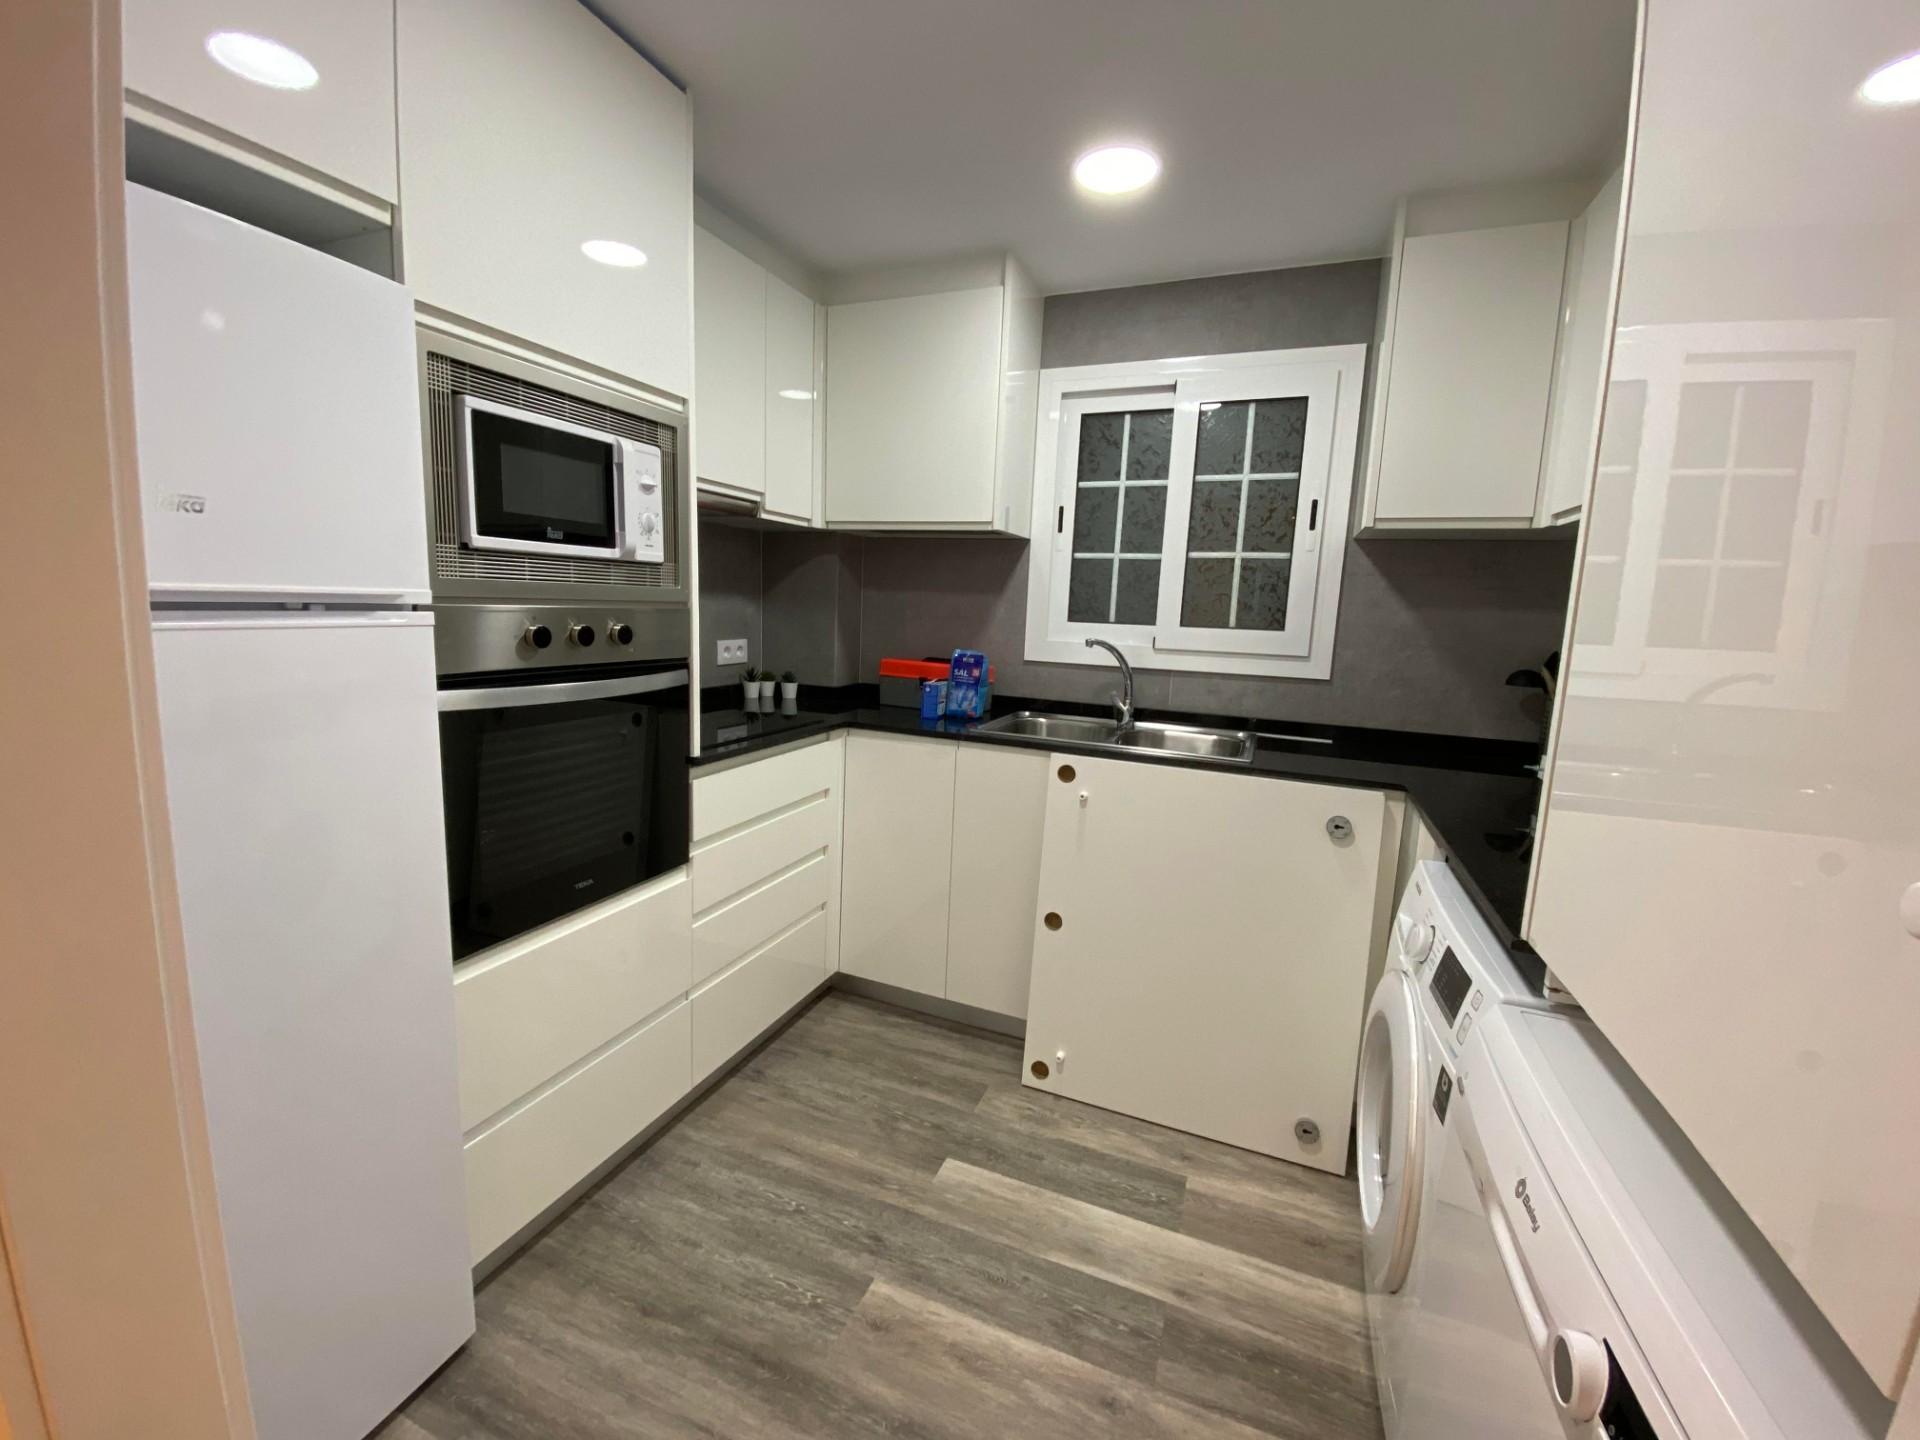 Cocina / cuina / Cuisine / Kitchen